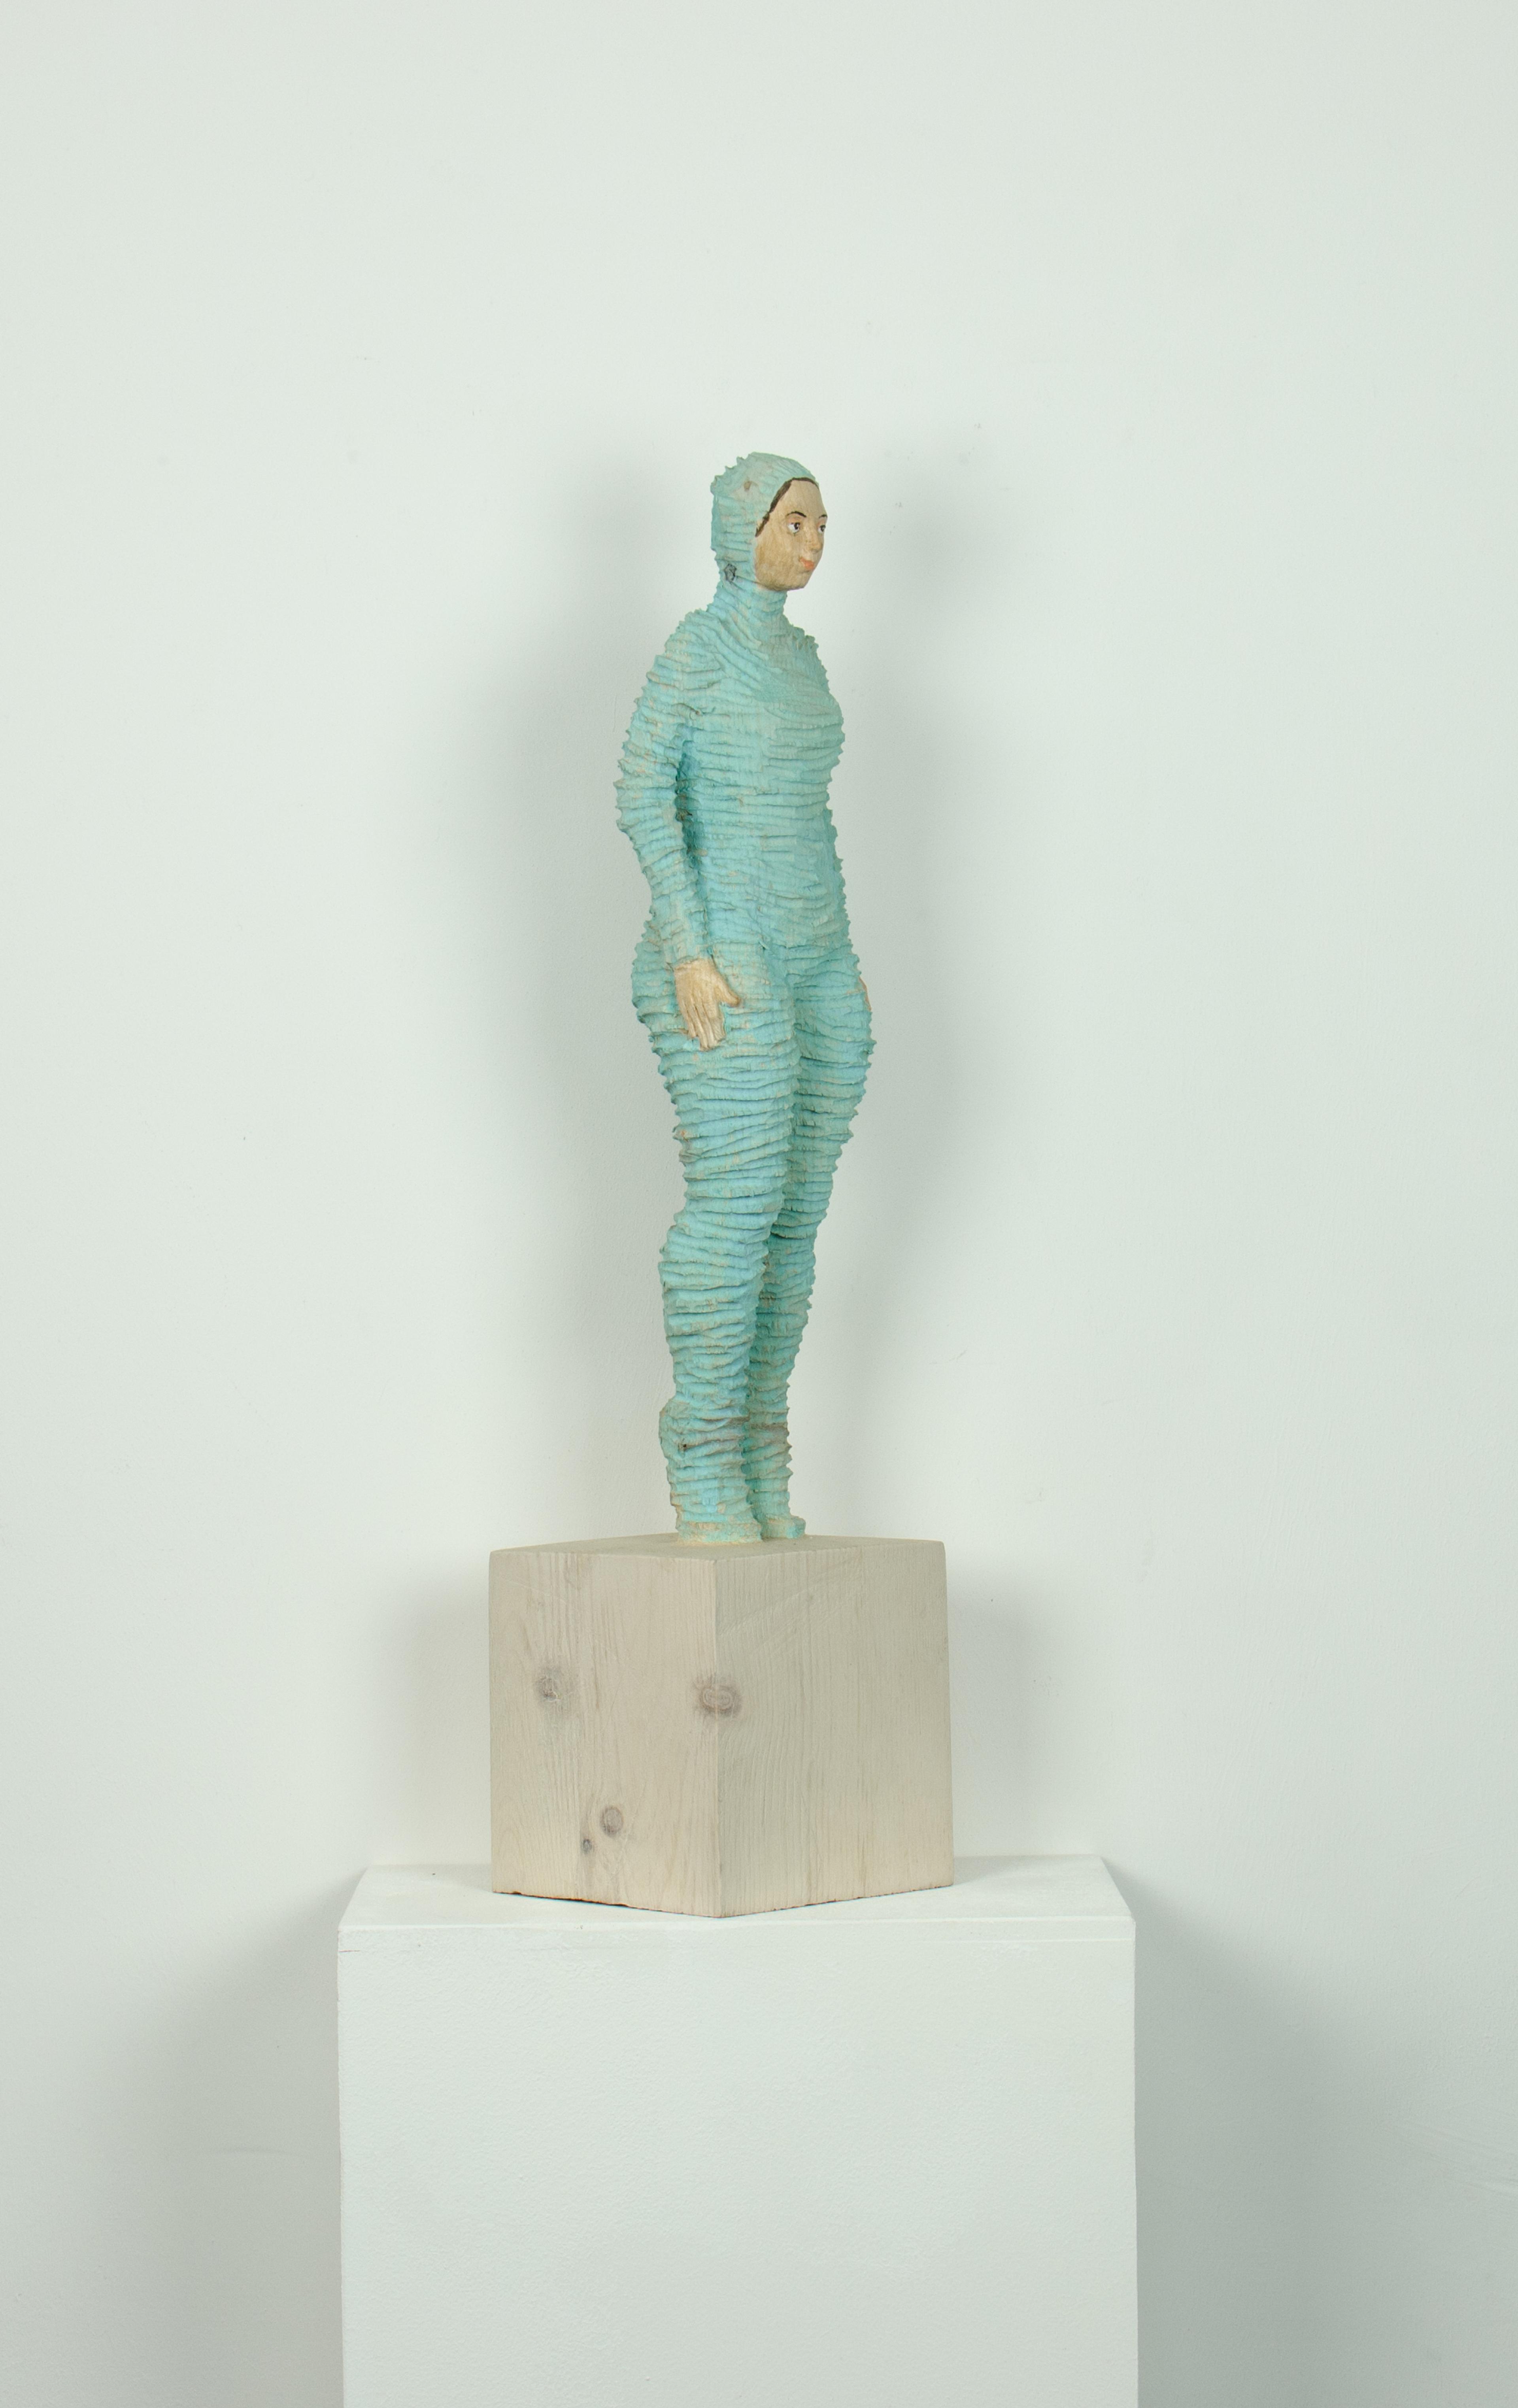 artwork umhüllt (türkis) by Isabel Ritter